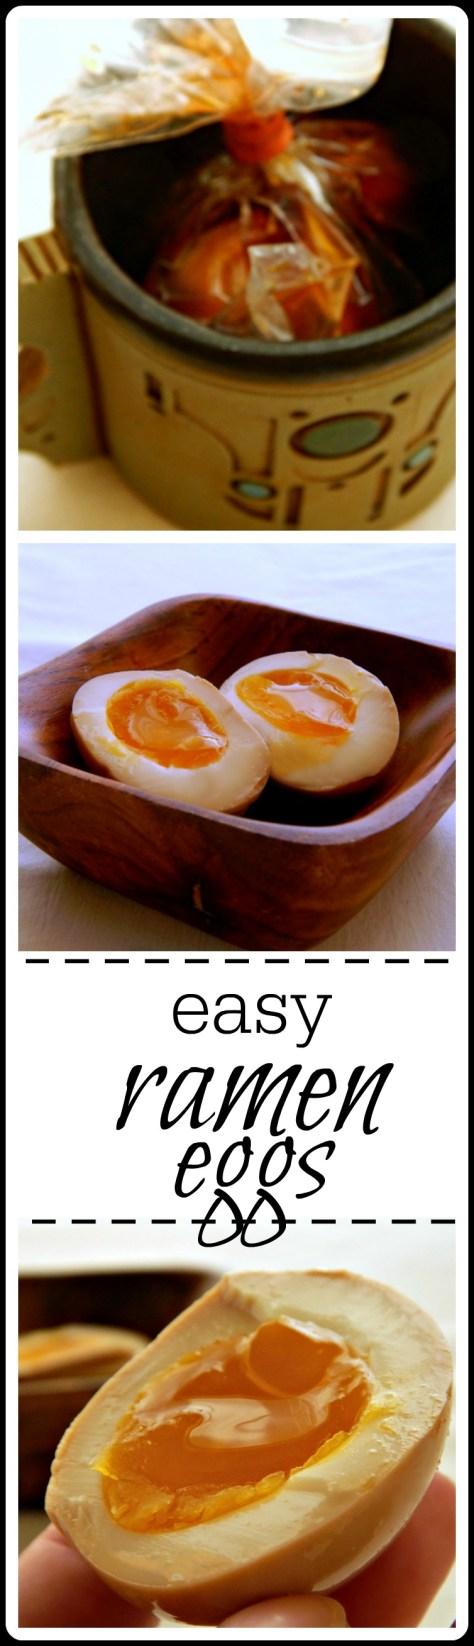 Easy Ramen Eggs: Soft boil, peel & soak. So good and super special.